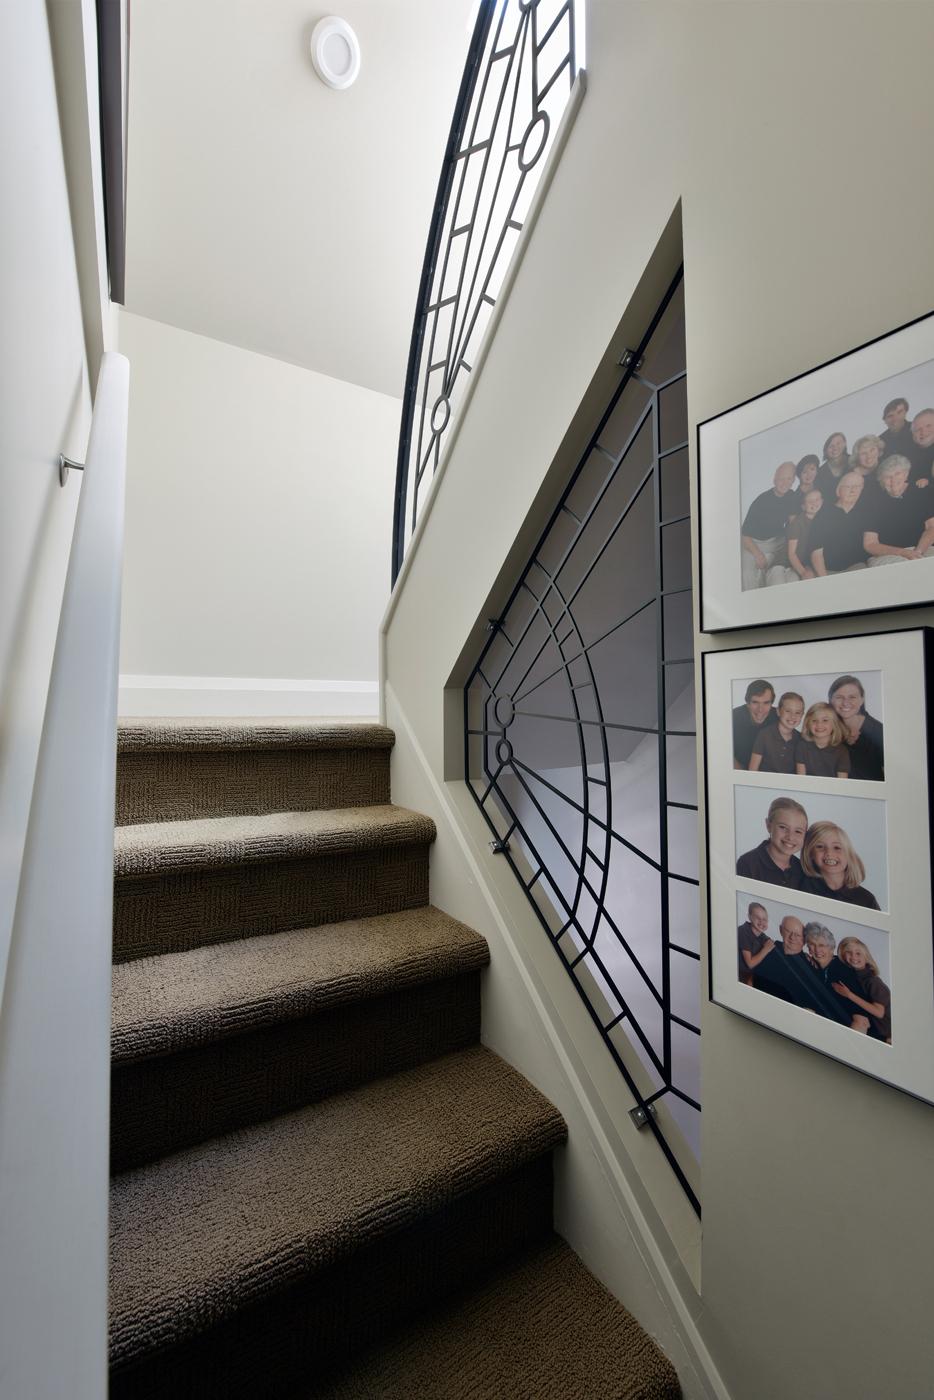 Smith stairway 2.jpg